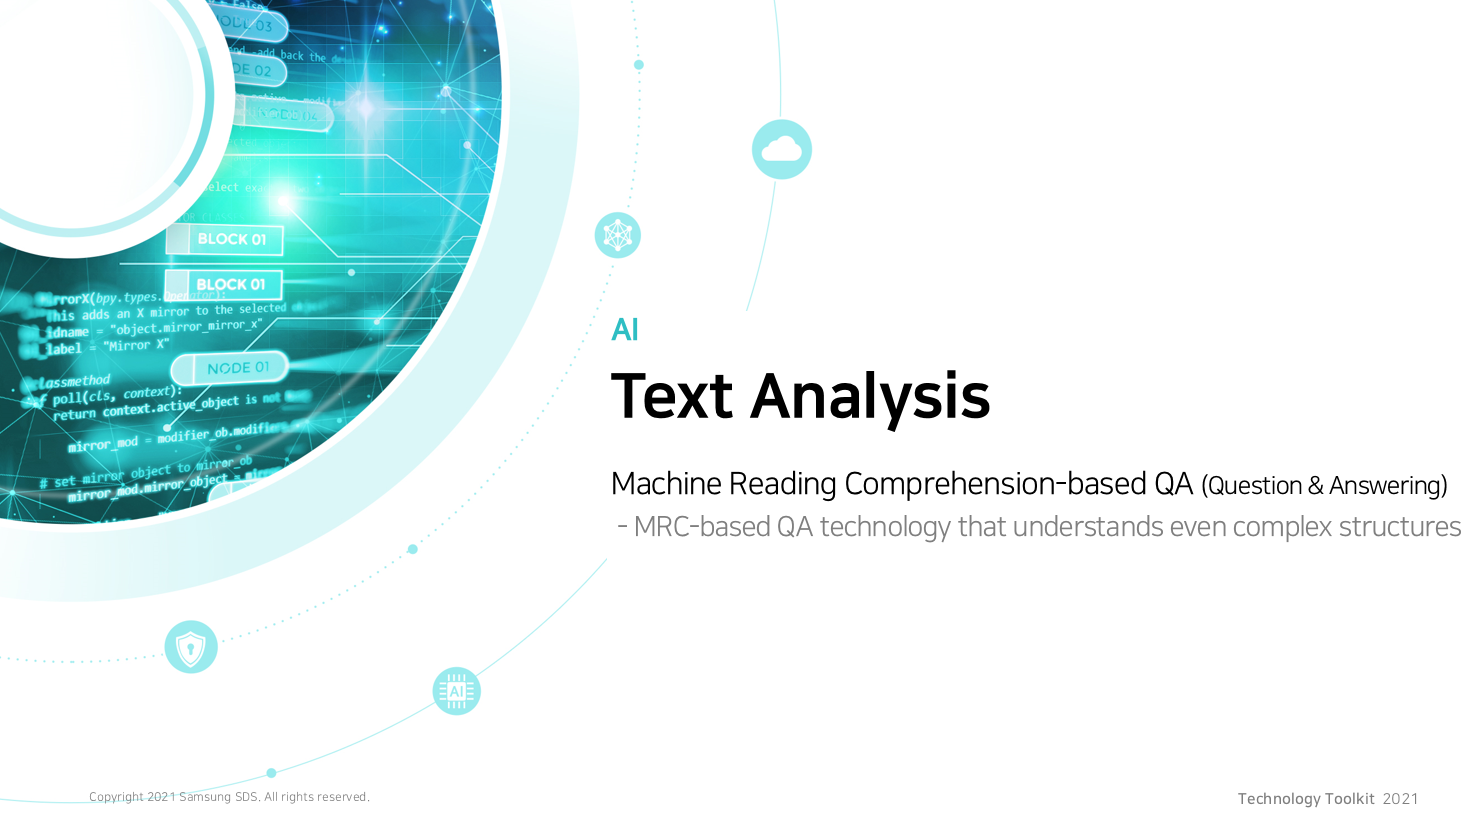 Machine Reading Comprehension-based QA